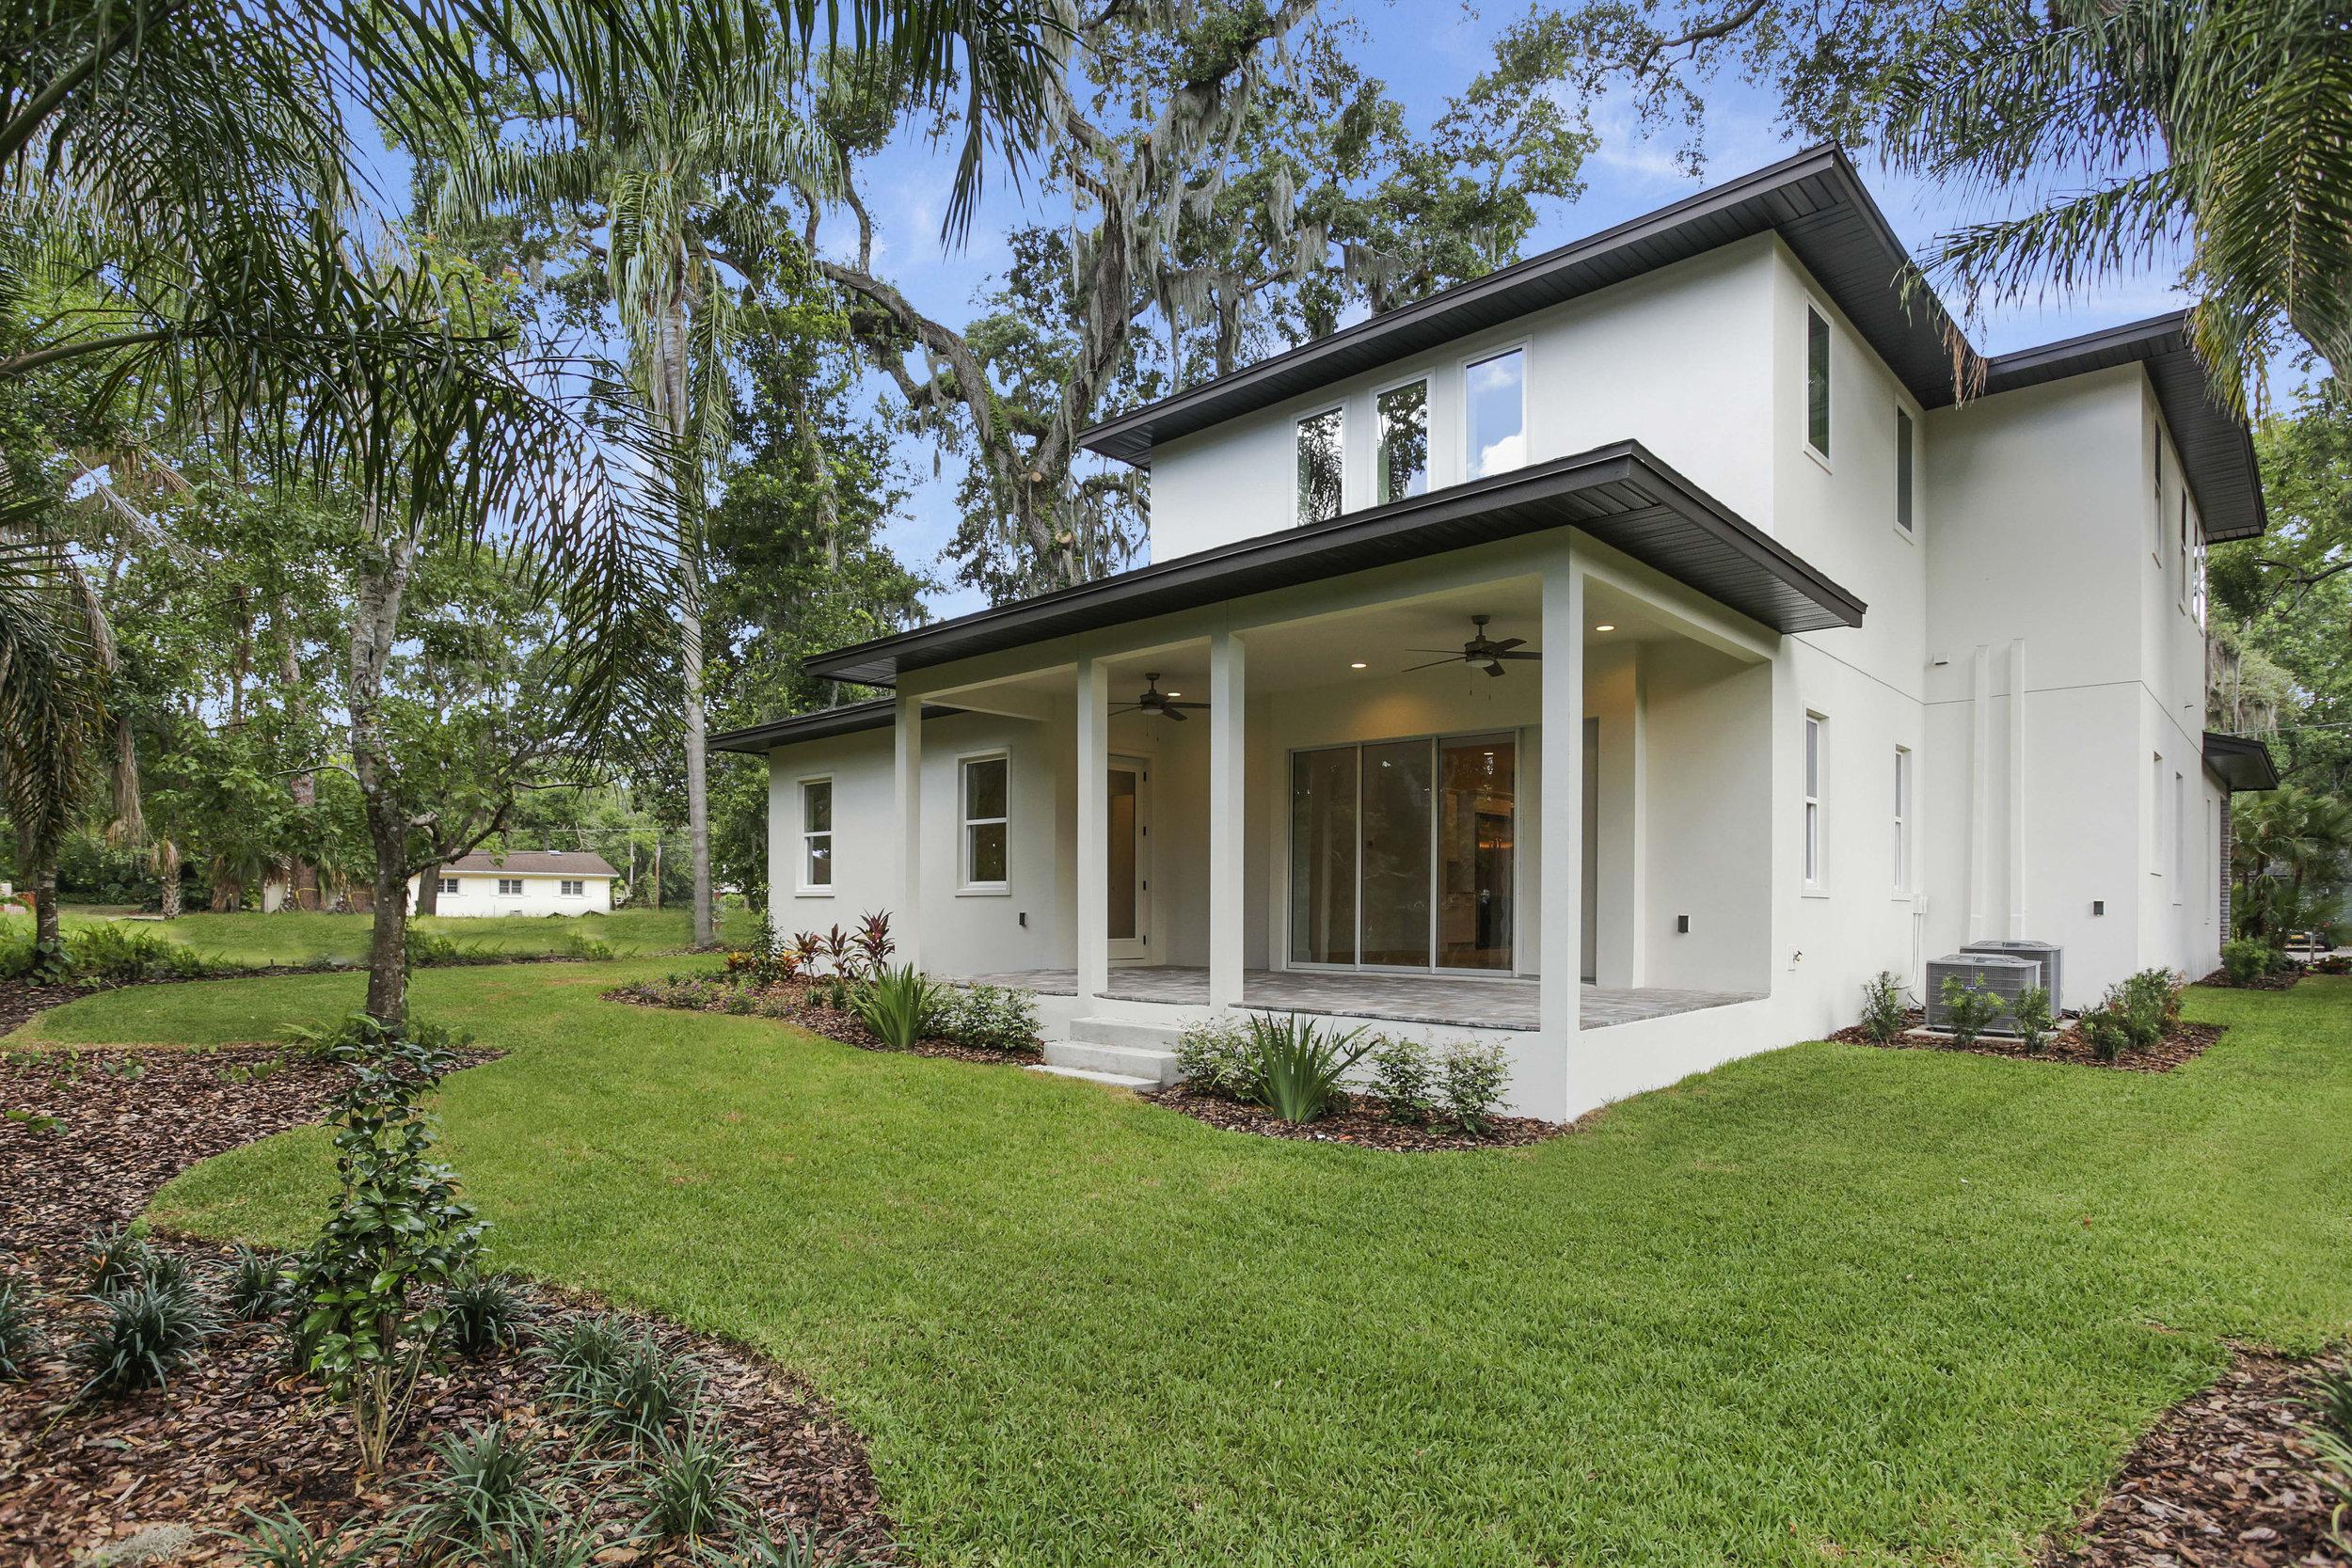 1008 Greenwood St, Orlando_IMG_5296.jpg